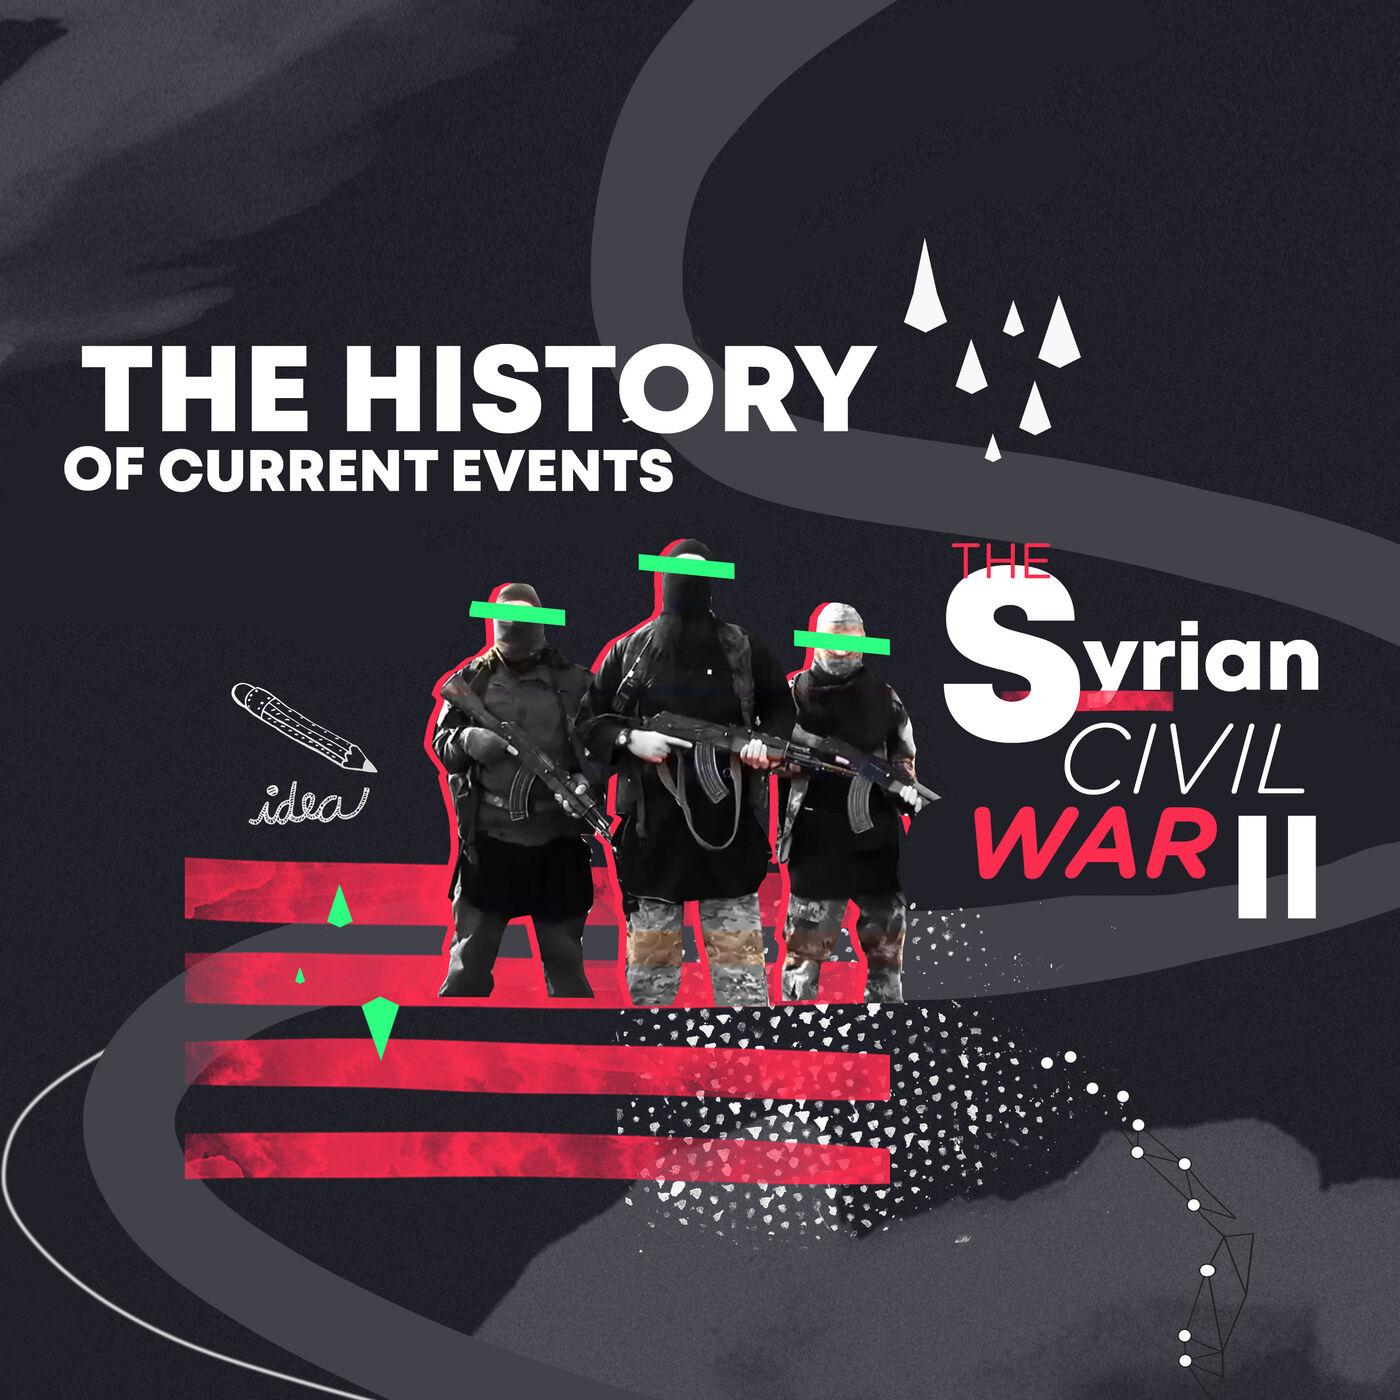 Syrian Civil War II